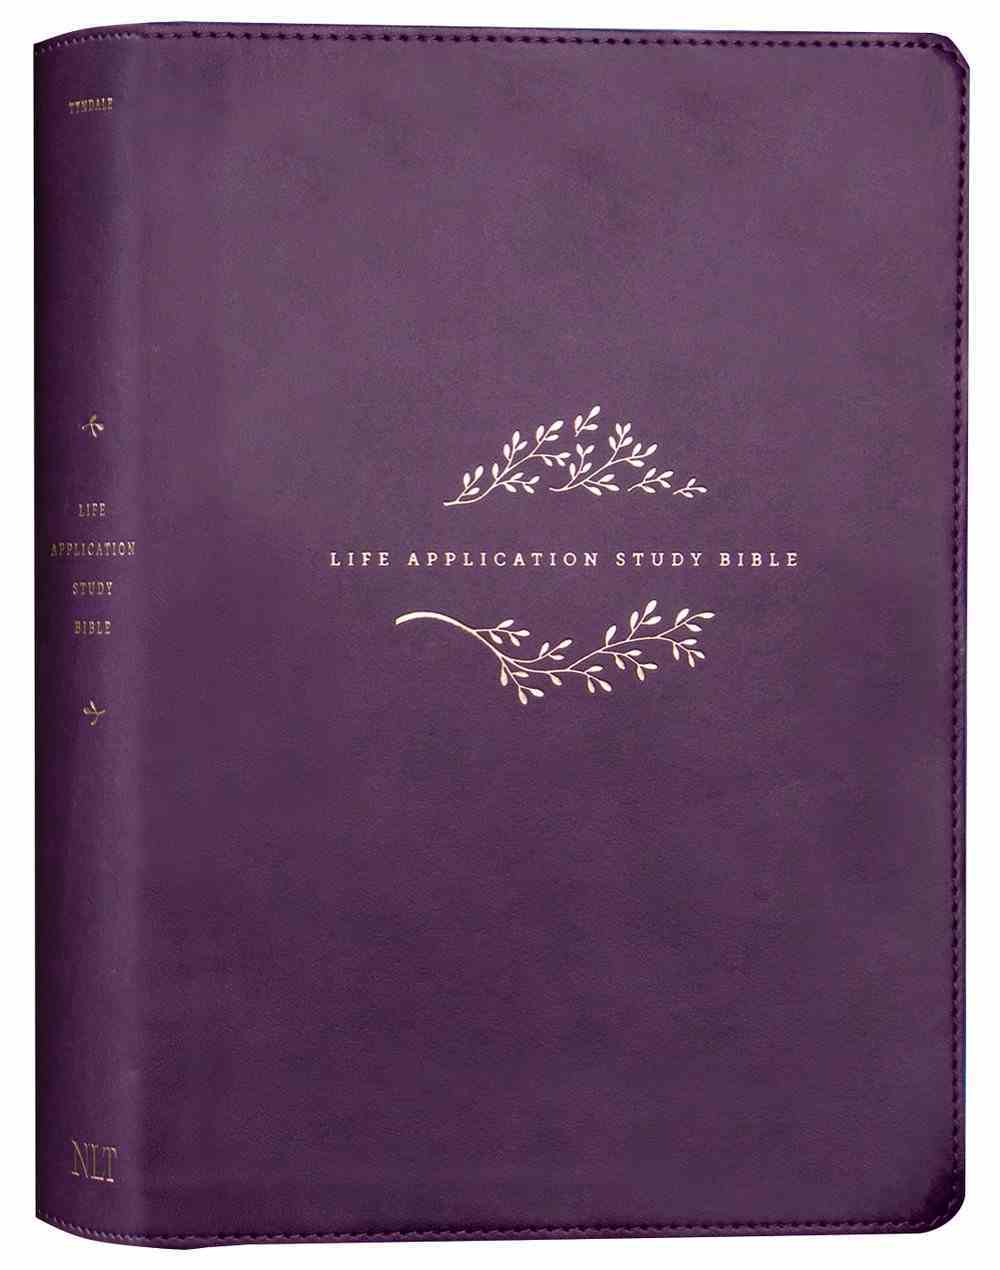 NLT Life Application Study Bible 3rd Edition Purple (Black Letter Edition) Imitation Leather